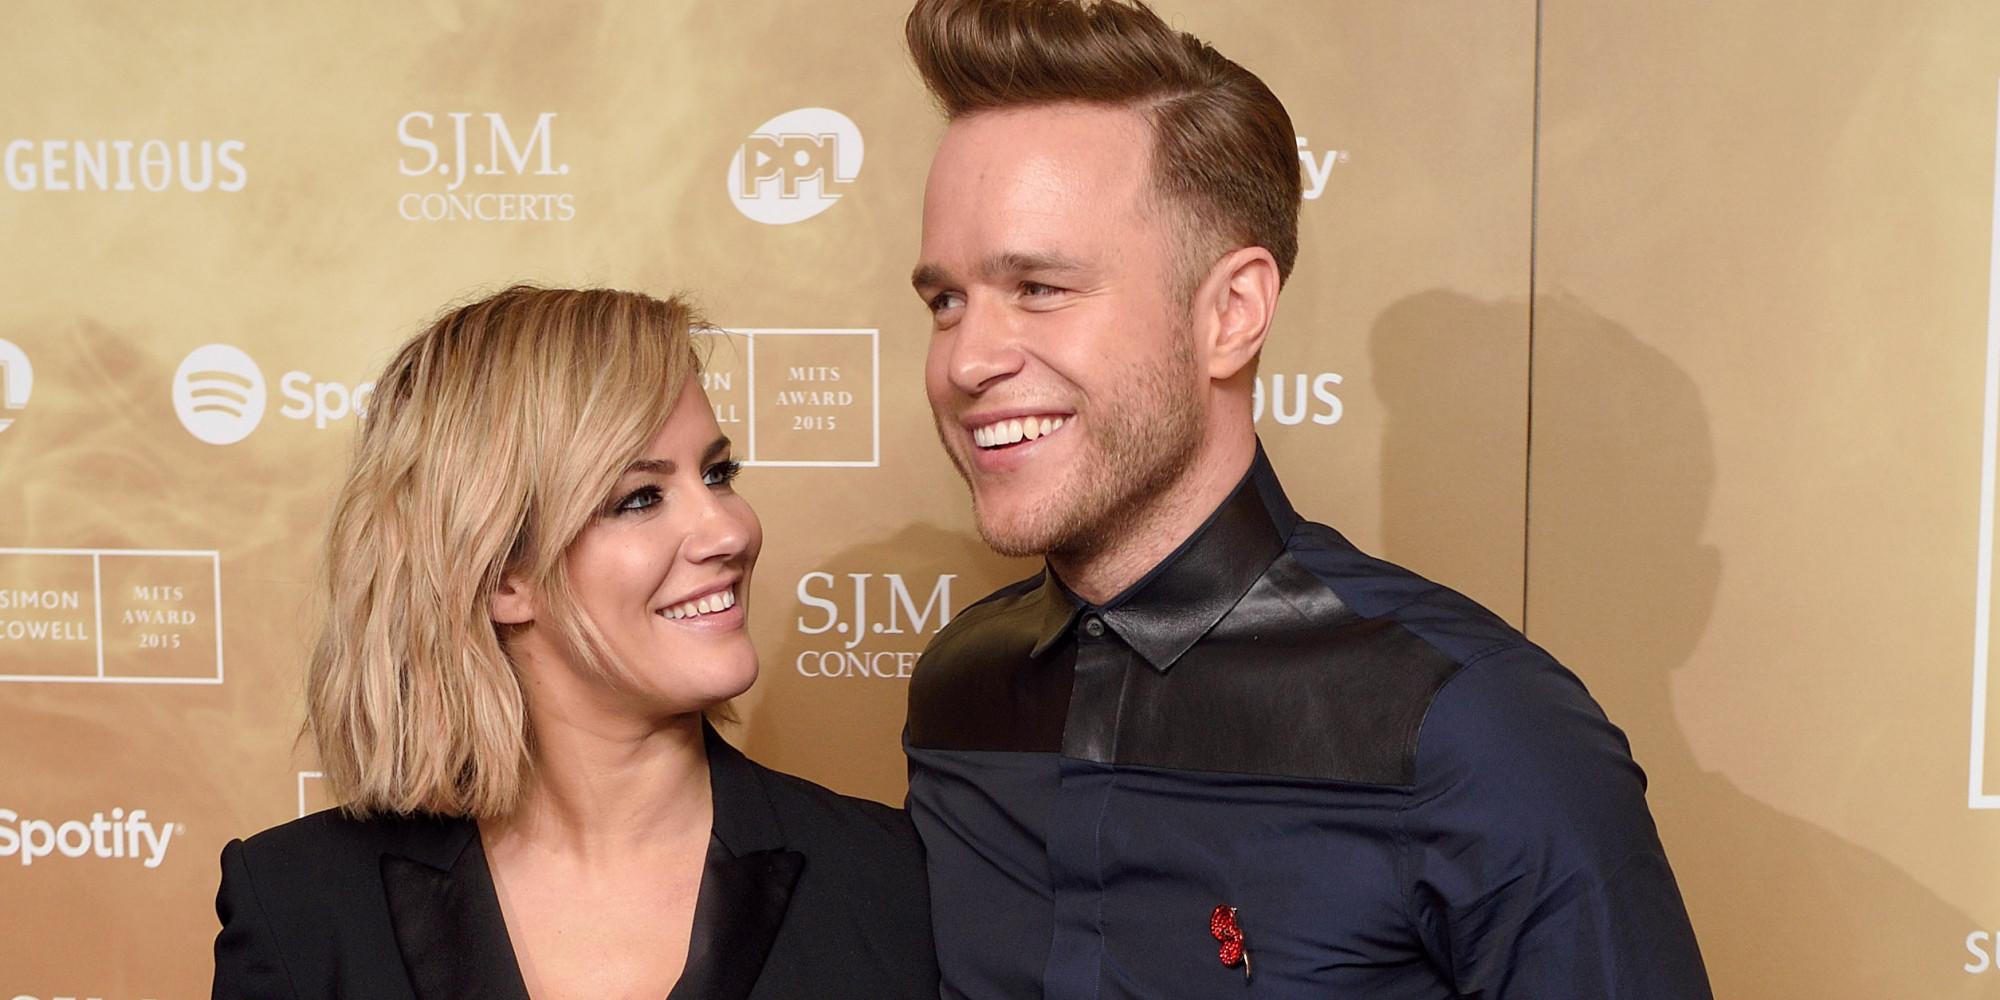 Olly murs black t shirt x factor -  X Factor Presenter Caroline Flack Admits She And Olly Murs Aren T On Dermot O Leary S Level Right Now Huffpost Uk